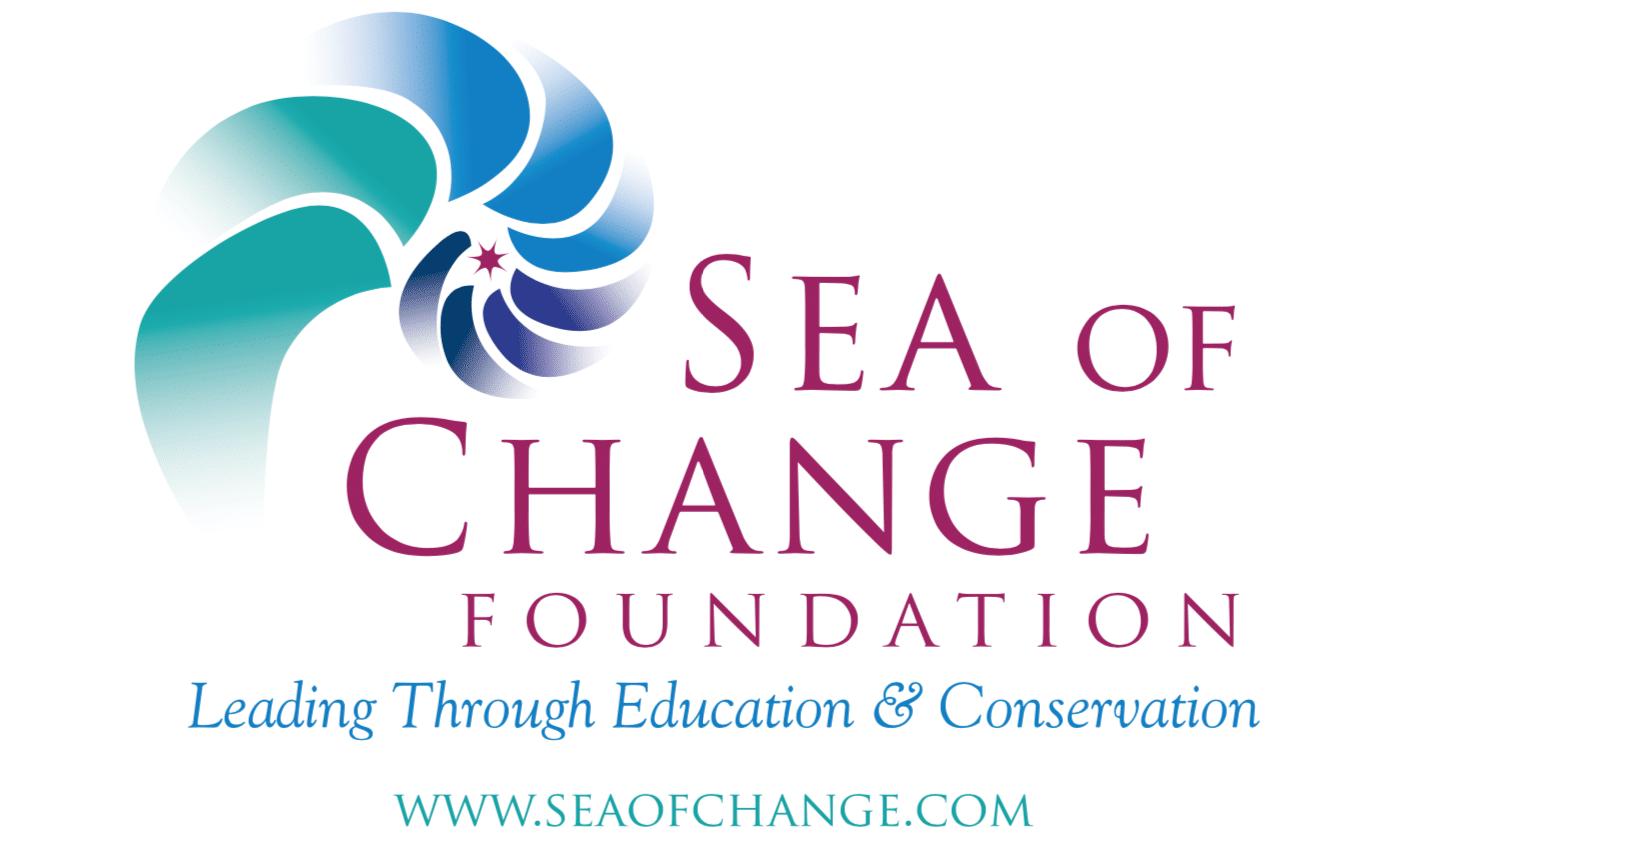 Sea Of Change Foundation